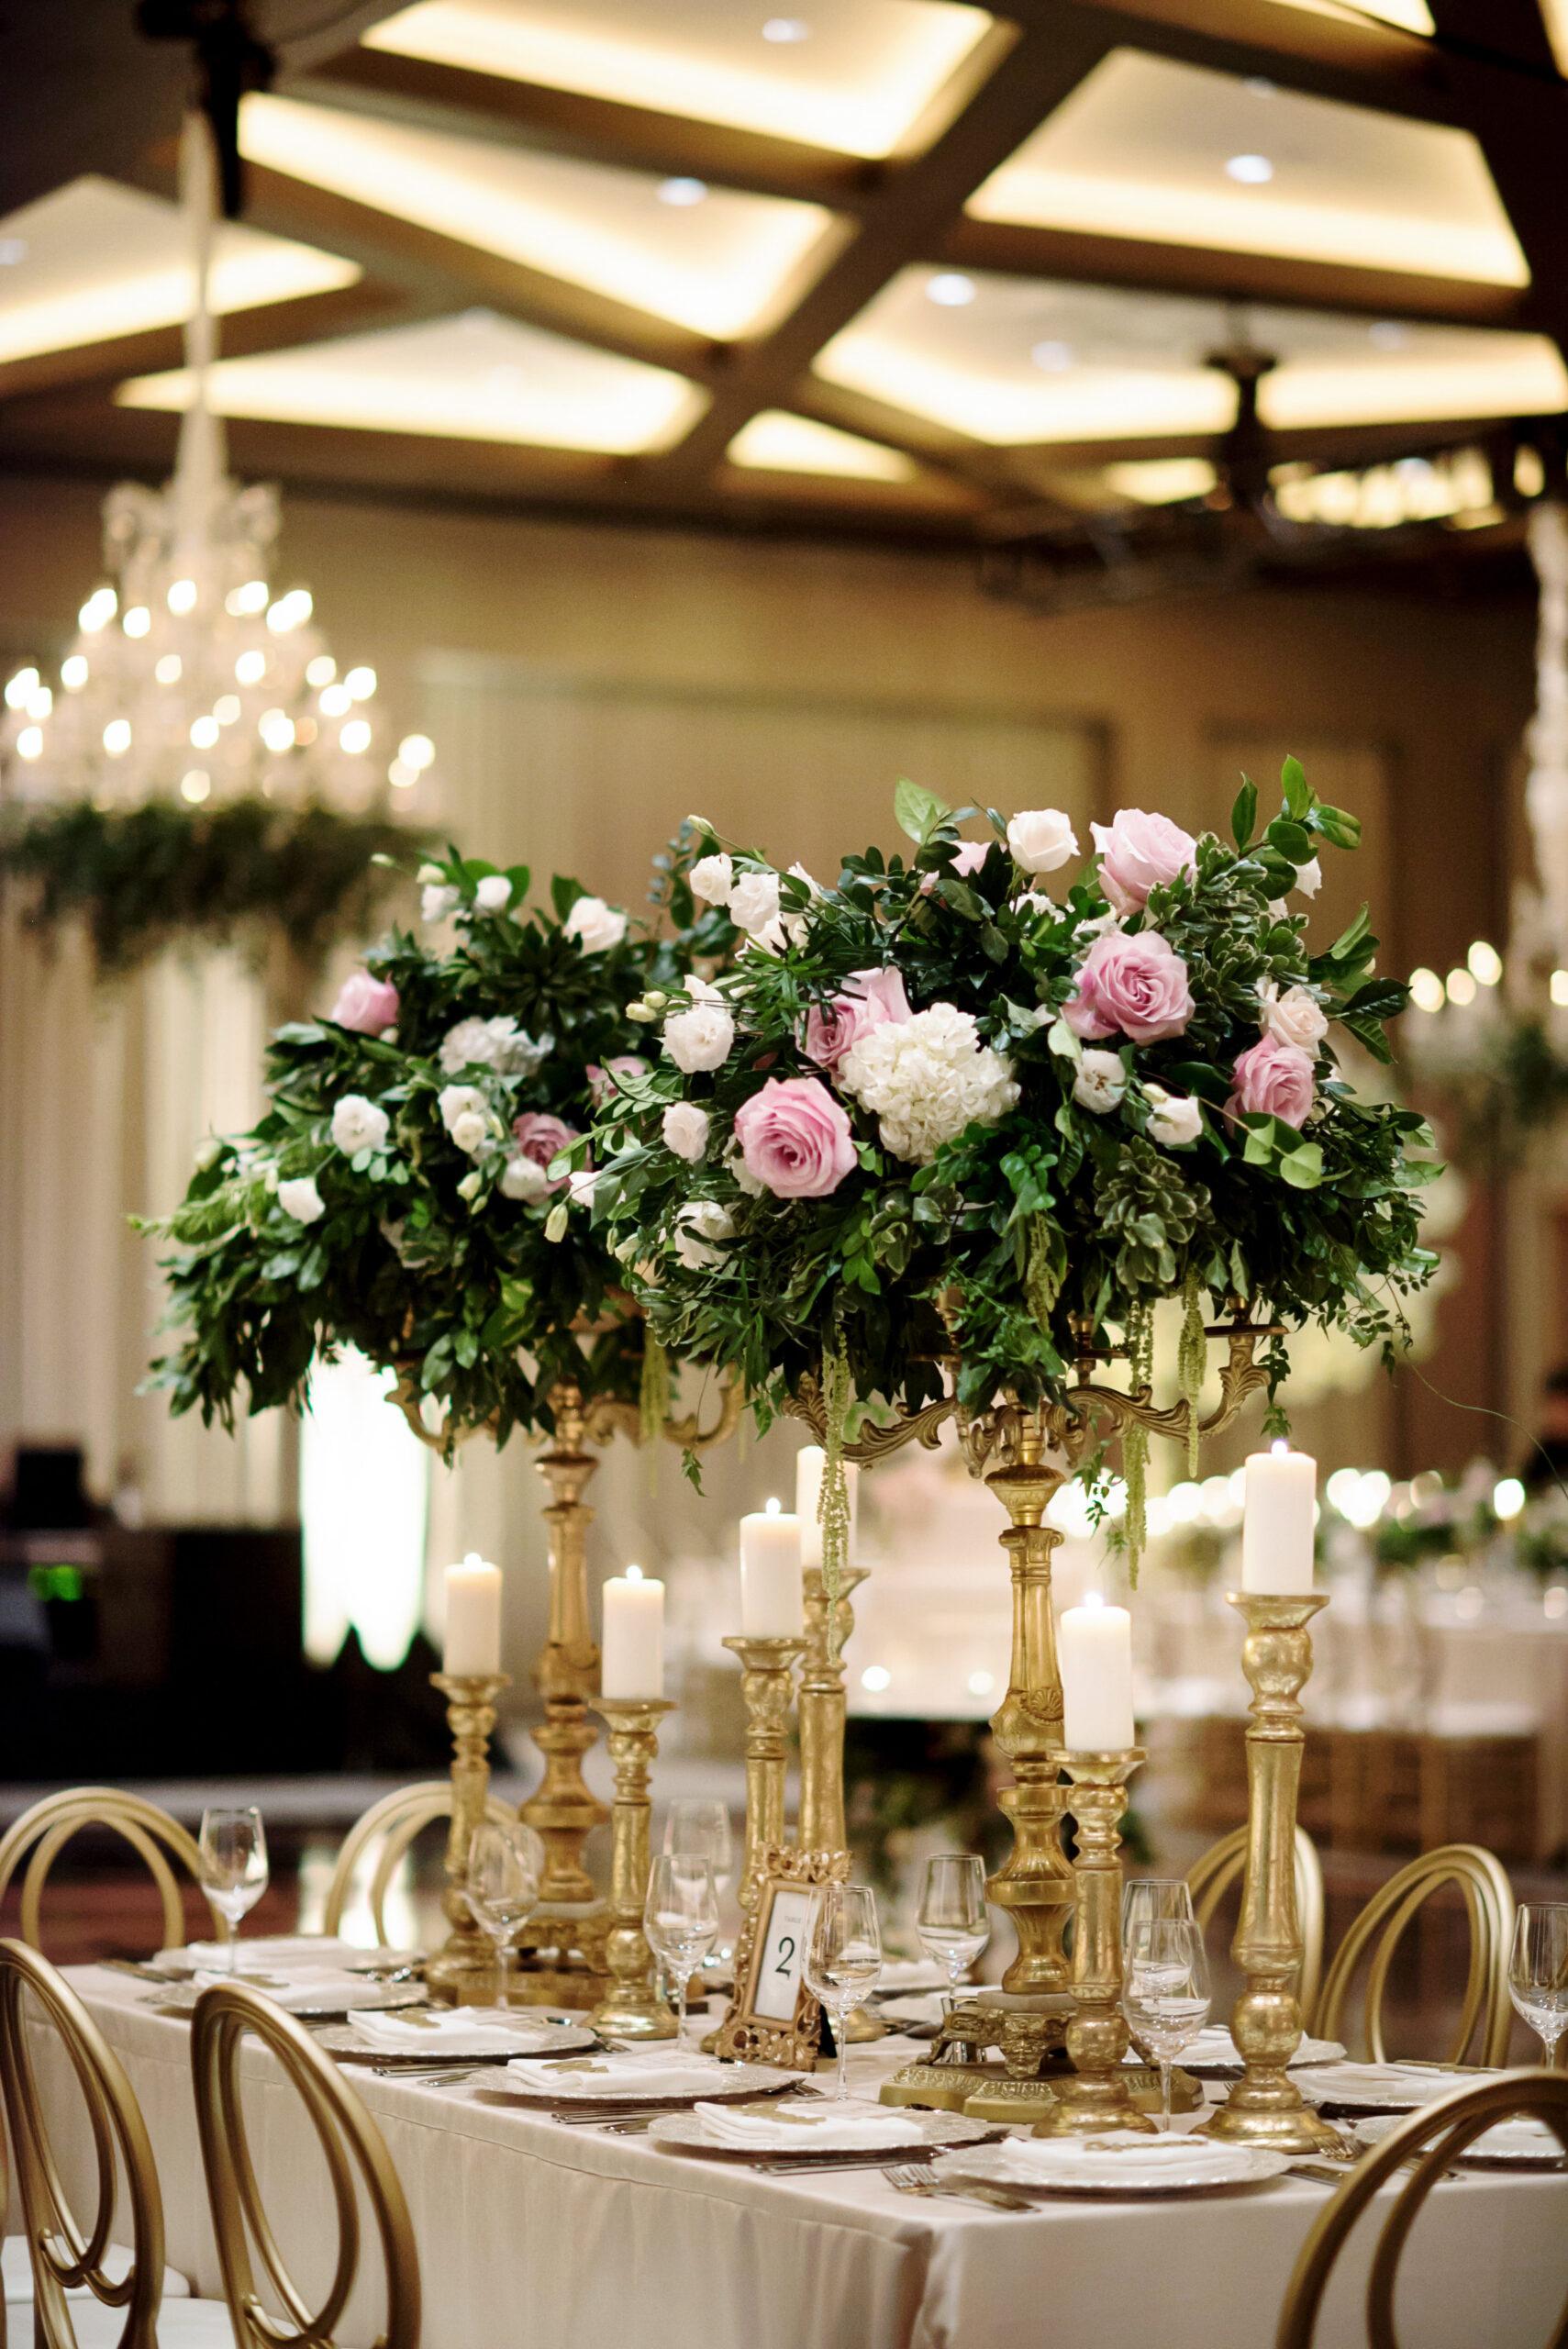 https://secureservercdn.net/45.40.145.151/kgq.ab5.myftpupload.com/wp-content/uploads/2020/04/Sanam-Soroush-s-Wedding-wedluxe-submission-0084-scaled.jpg?time=1606414923